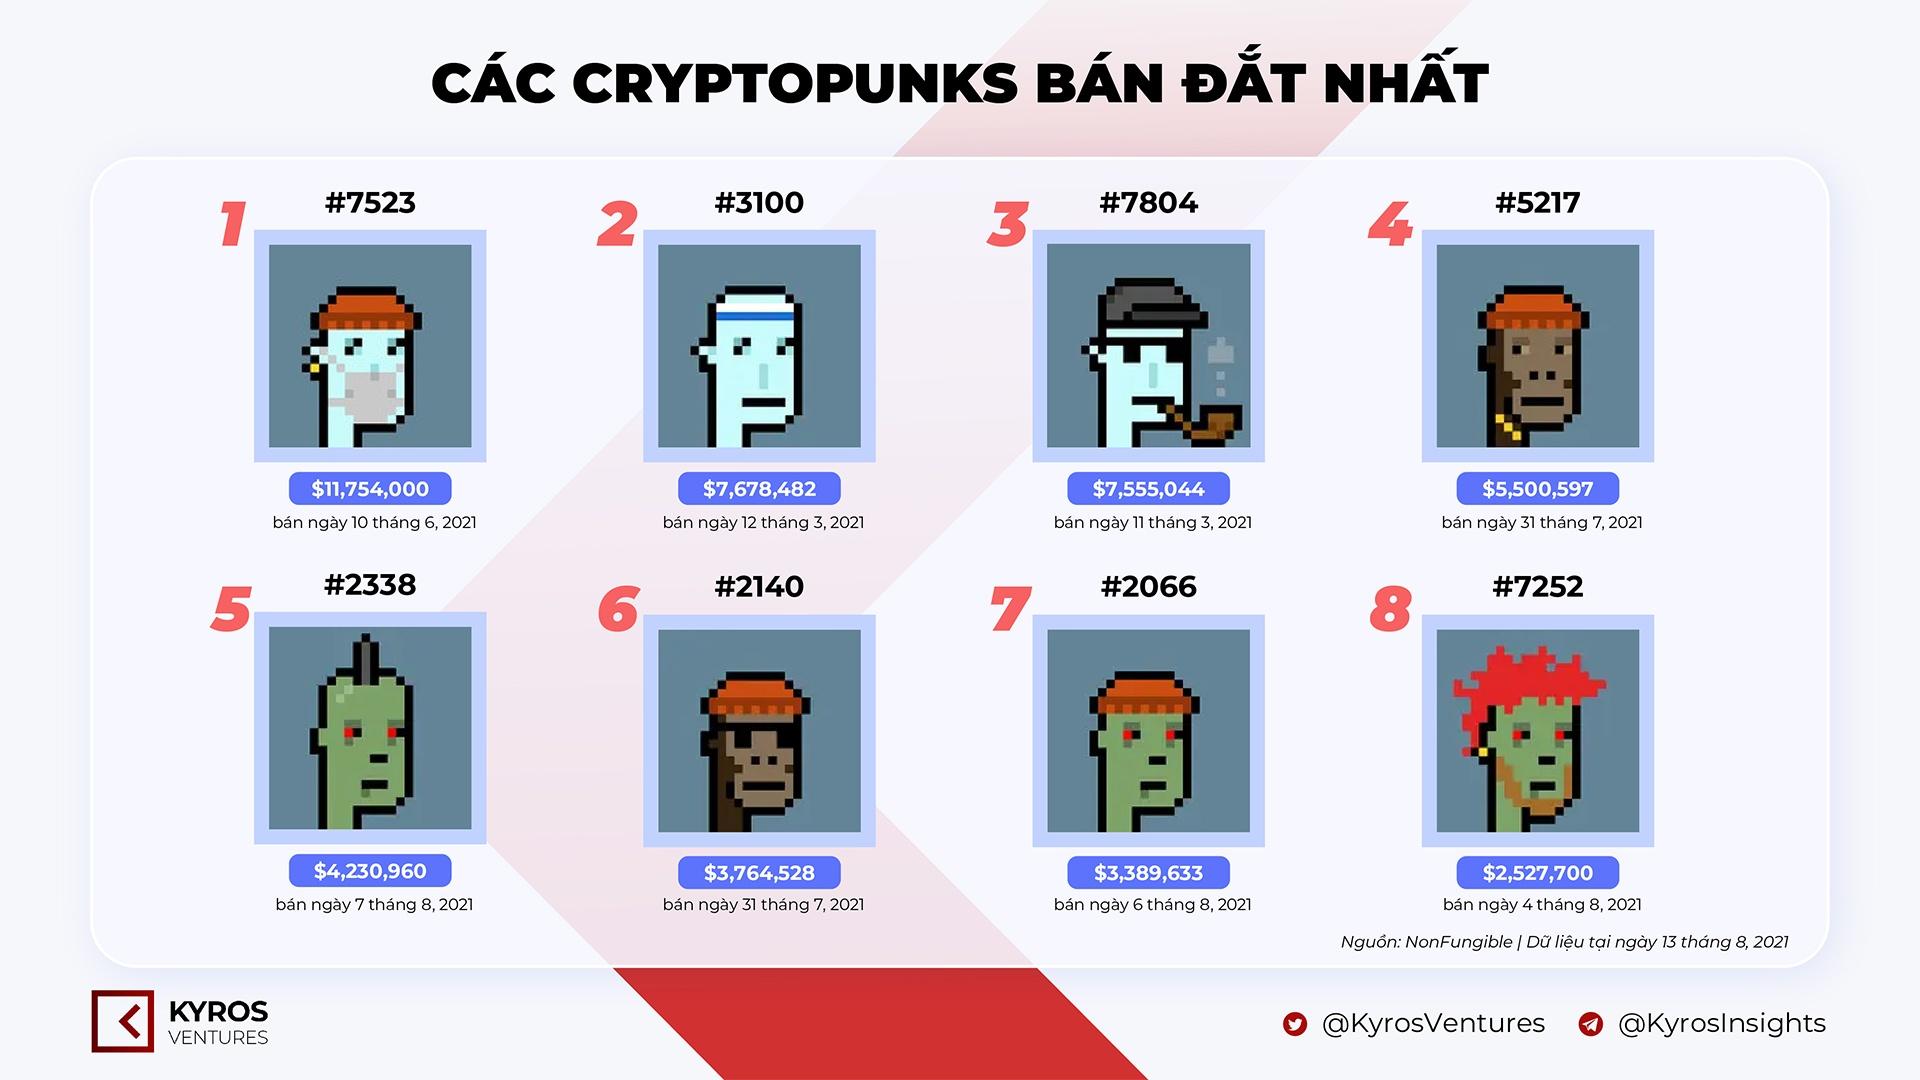 CRYPTOPUNKS-du-an-nft